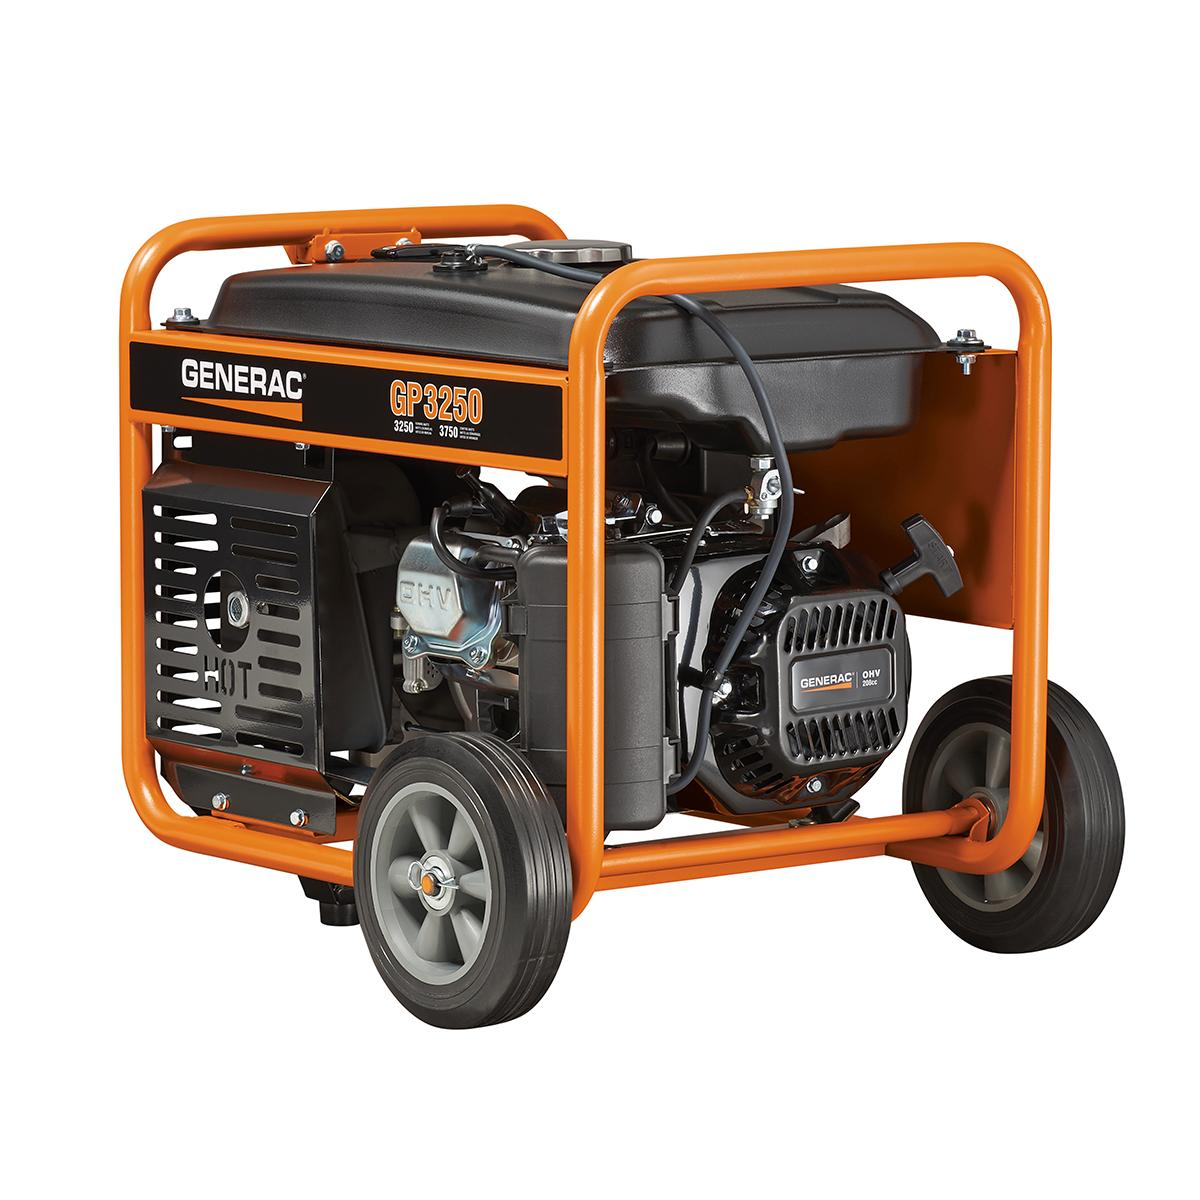 Amazon.com: Generac gp18001, 3250 watt, L, Anaranjado ...